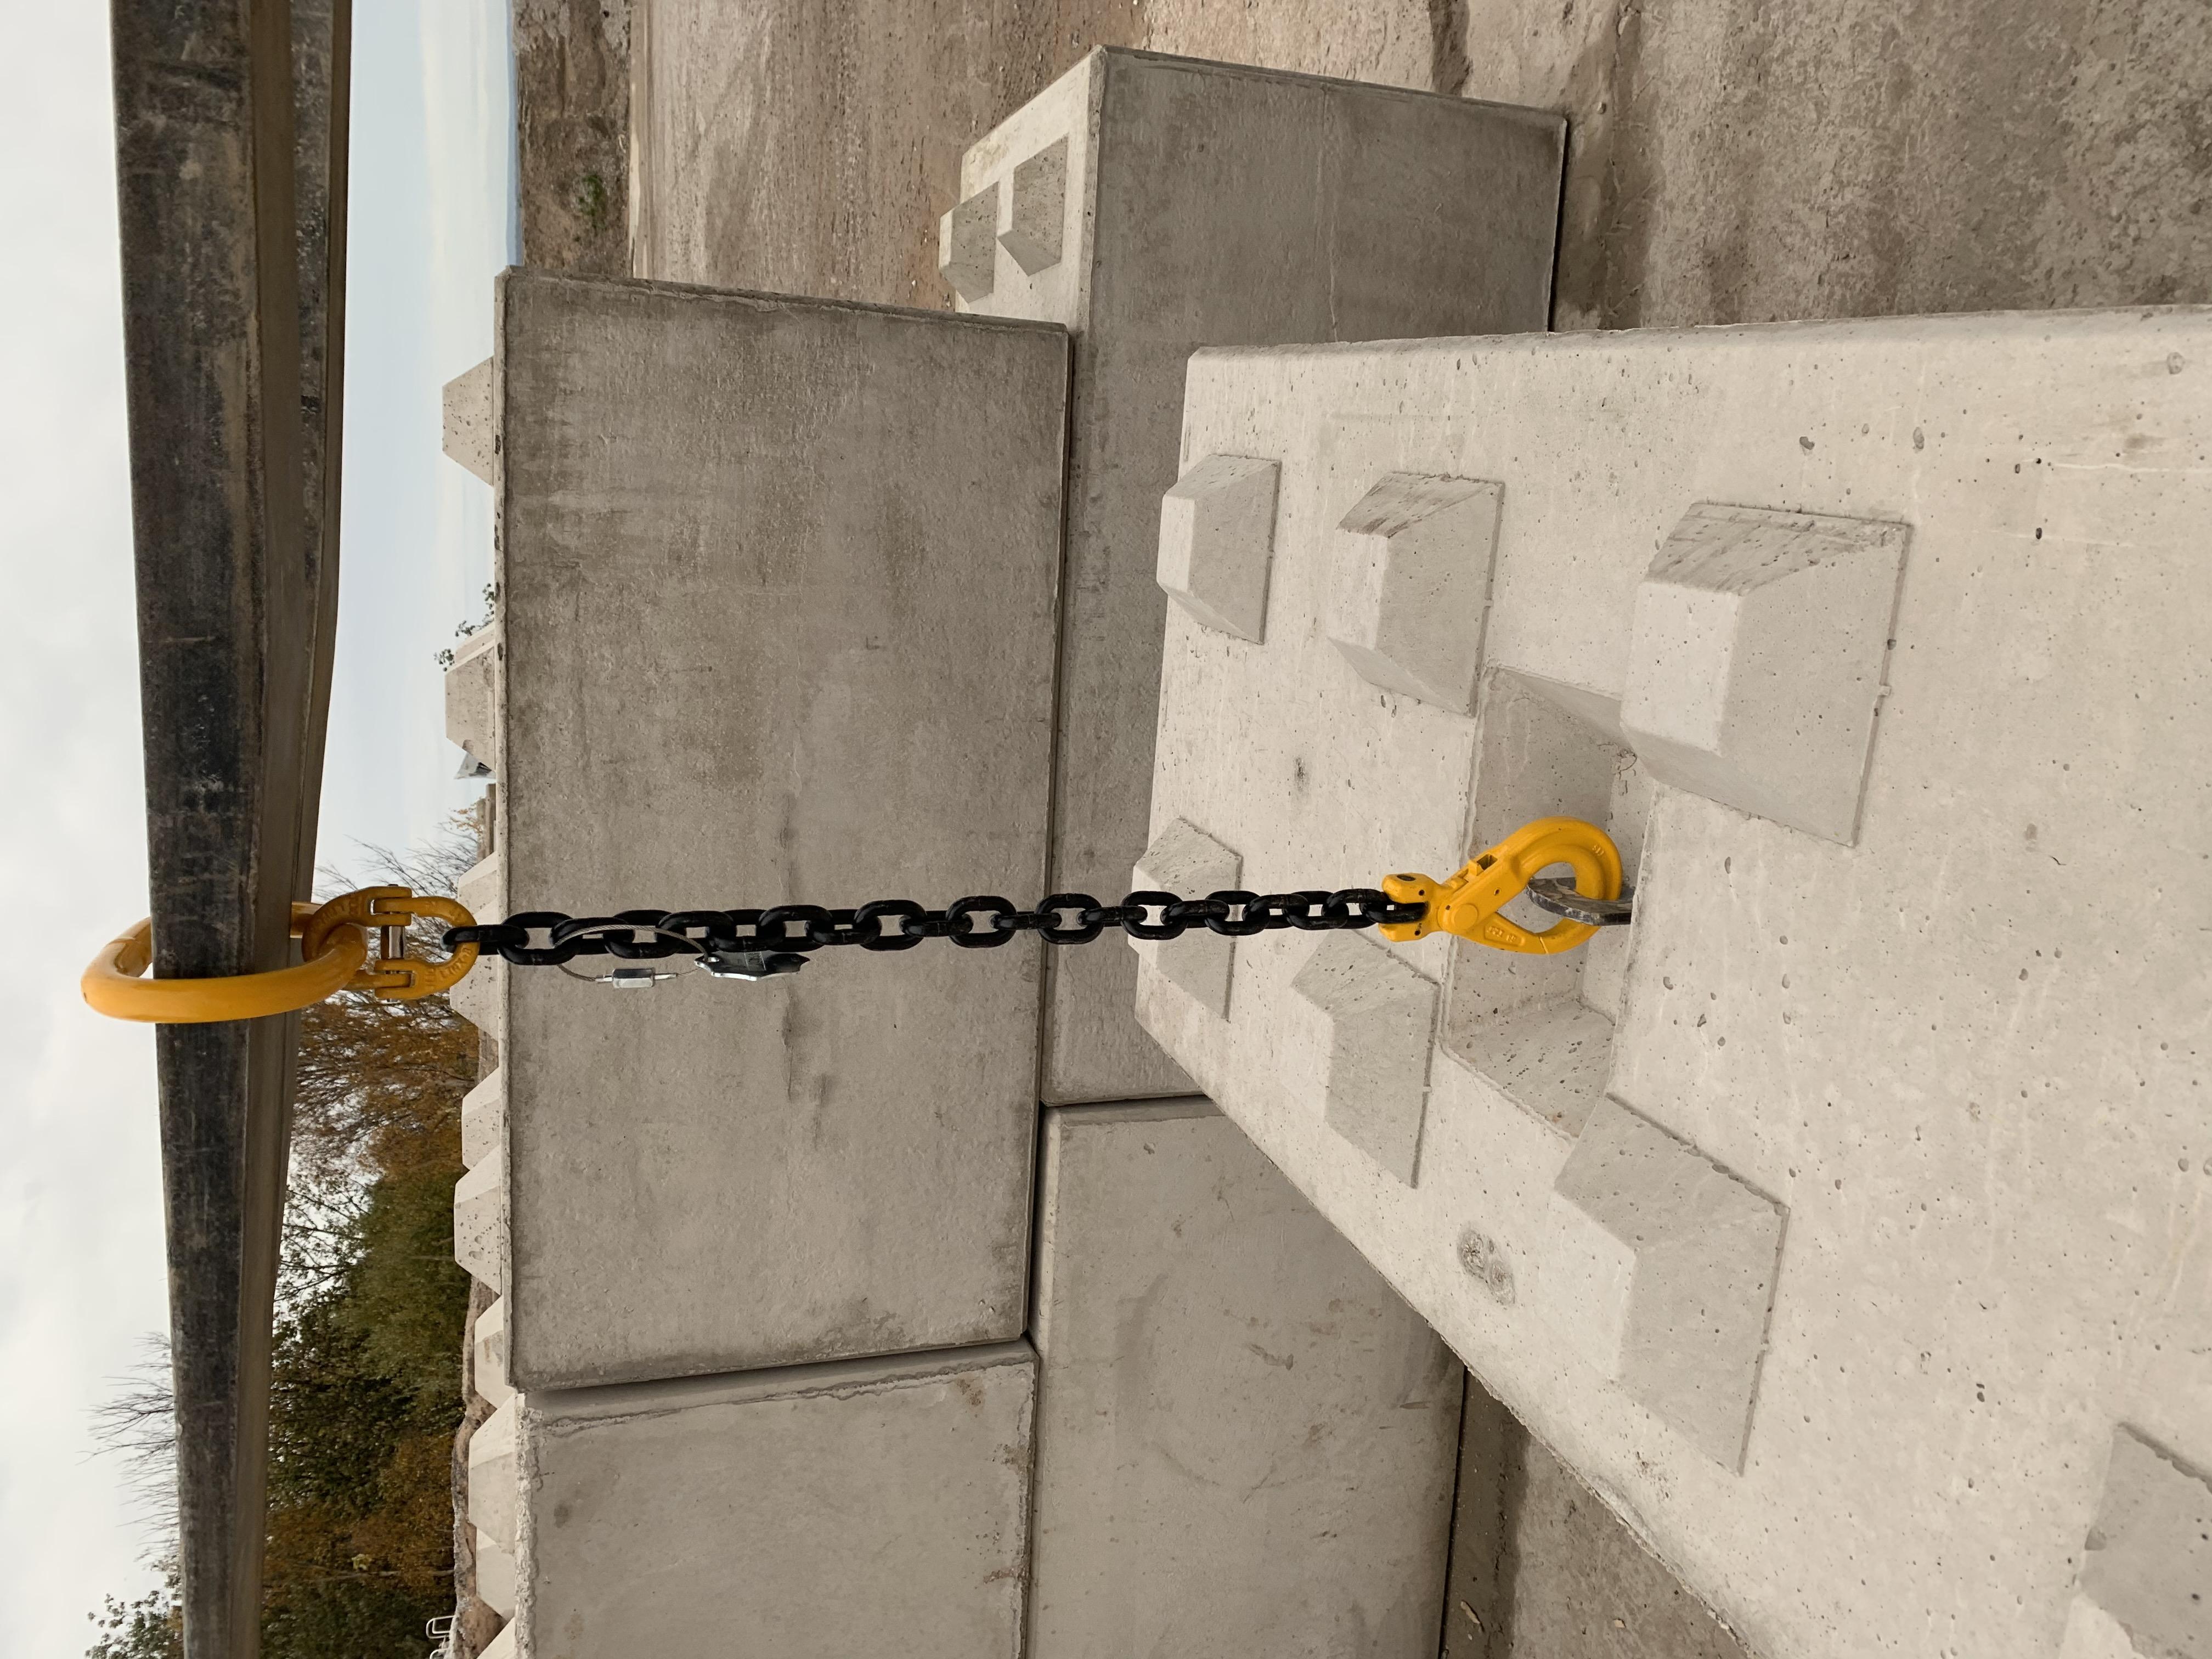 Concrete Lego Block 1